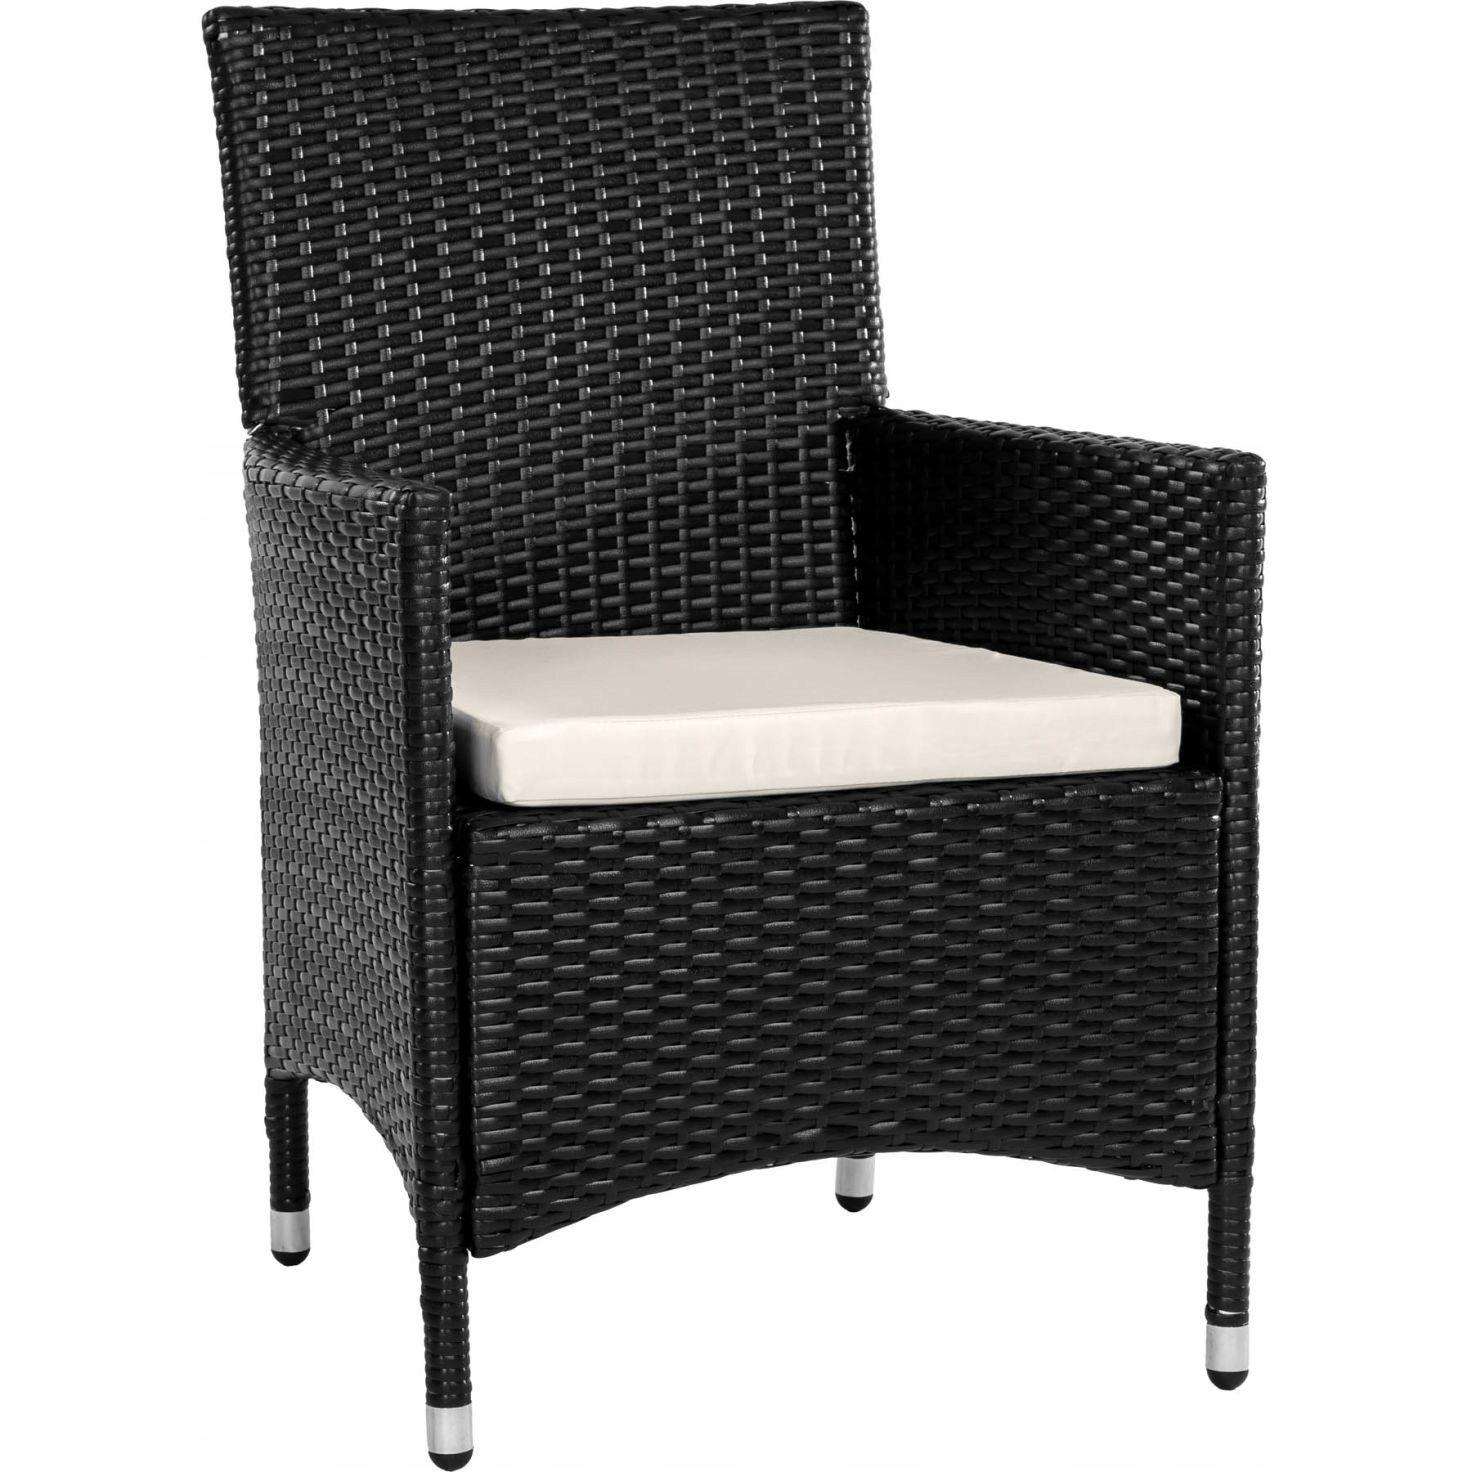 Kup Teraz Na Allegro Pl Za 149 99 Zl Fotel Krzeslo Ogrodowe Polirattan Rattan Krzesla 9169261534 Allegro Pl Outdoor Furniture Outdoor Decor Outdoor Chairs